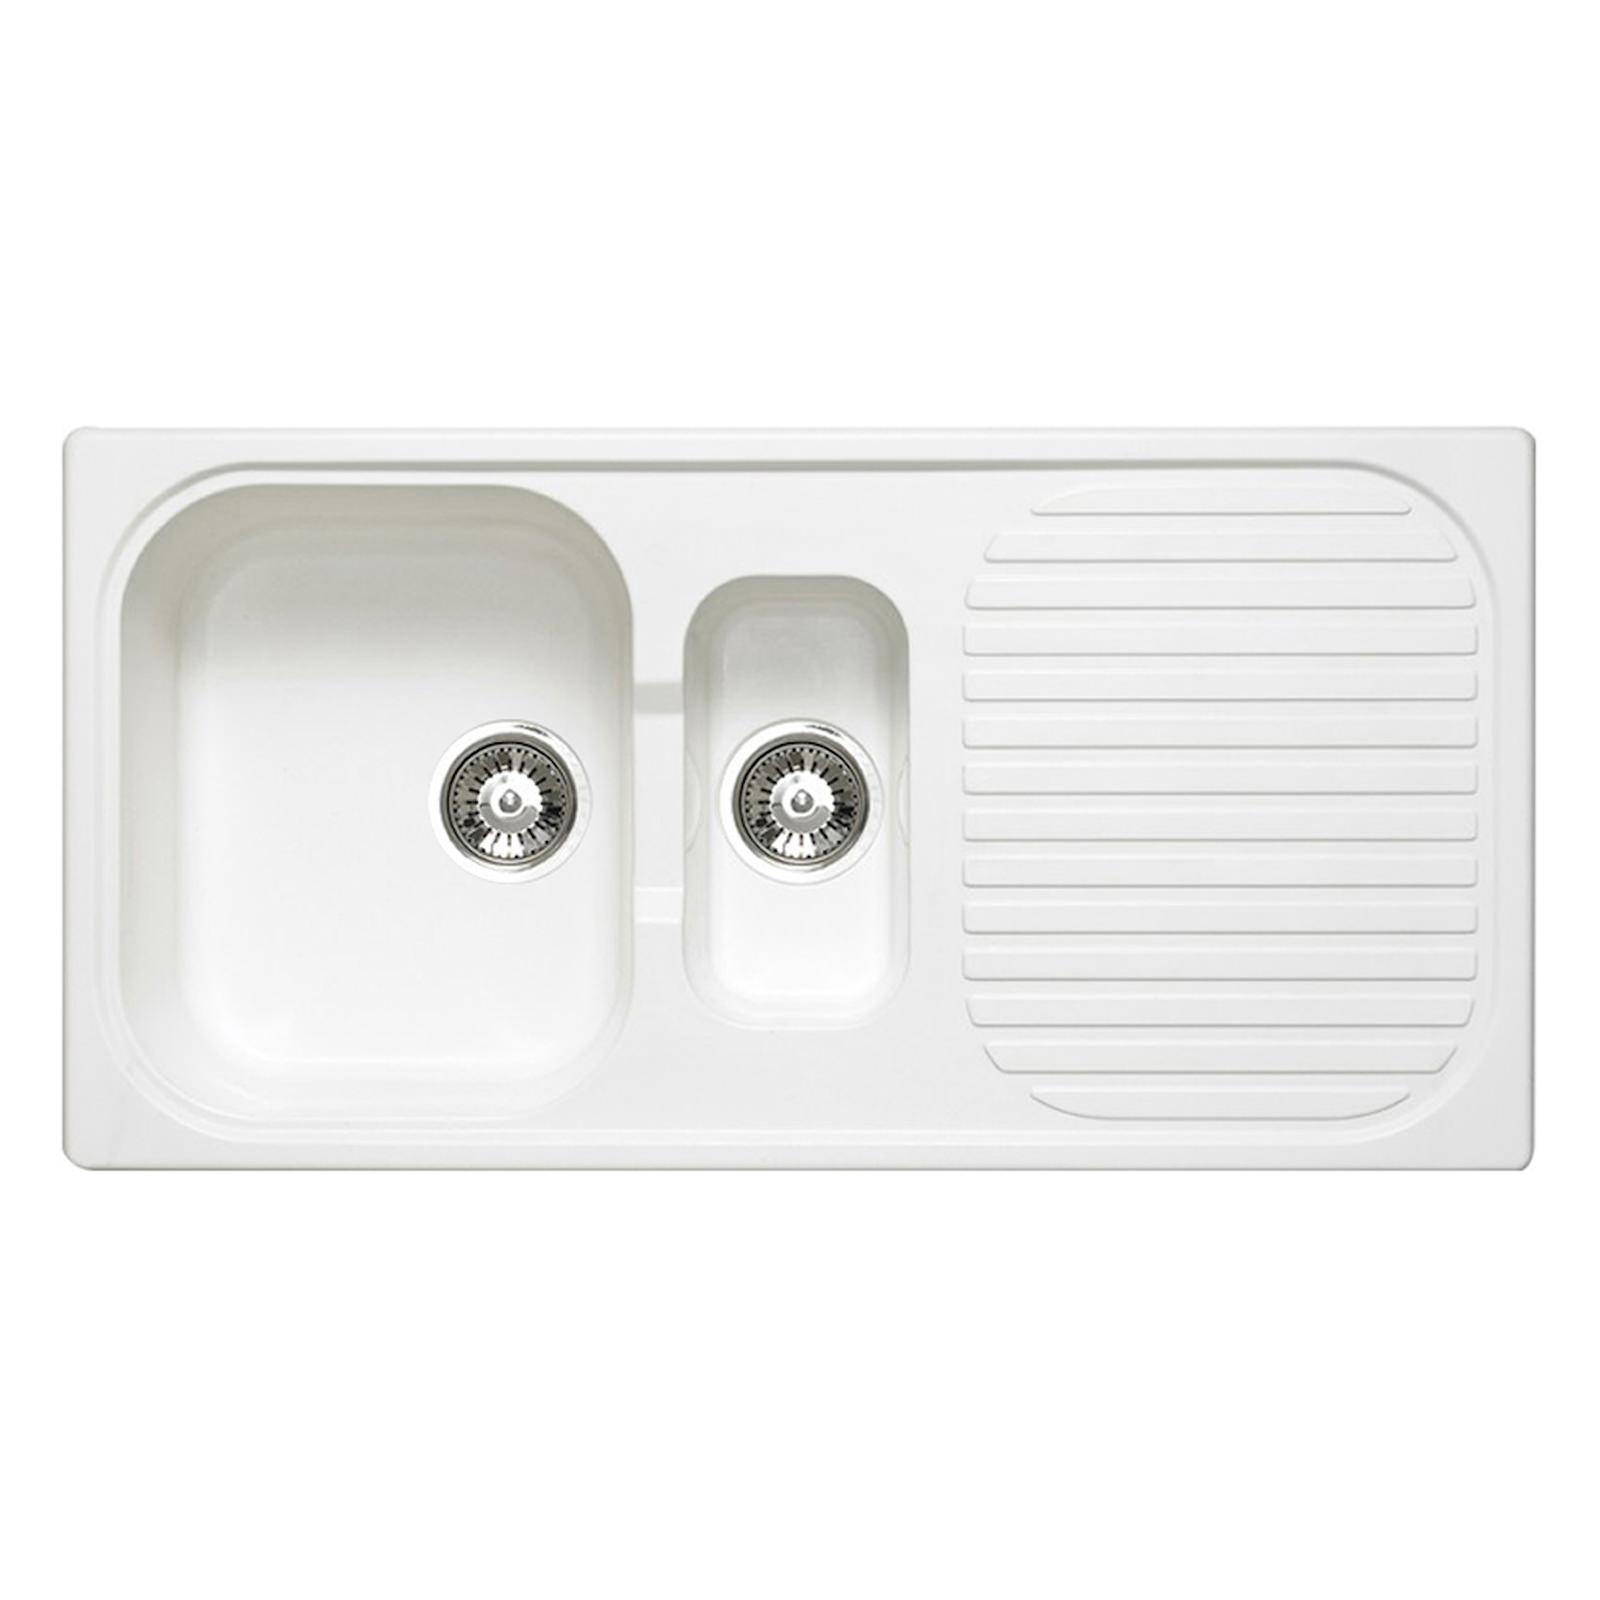 Astracast Msk 1 5 Bowl Composite Quartz White Inset Sink